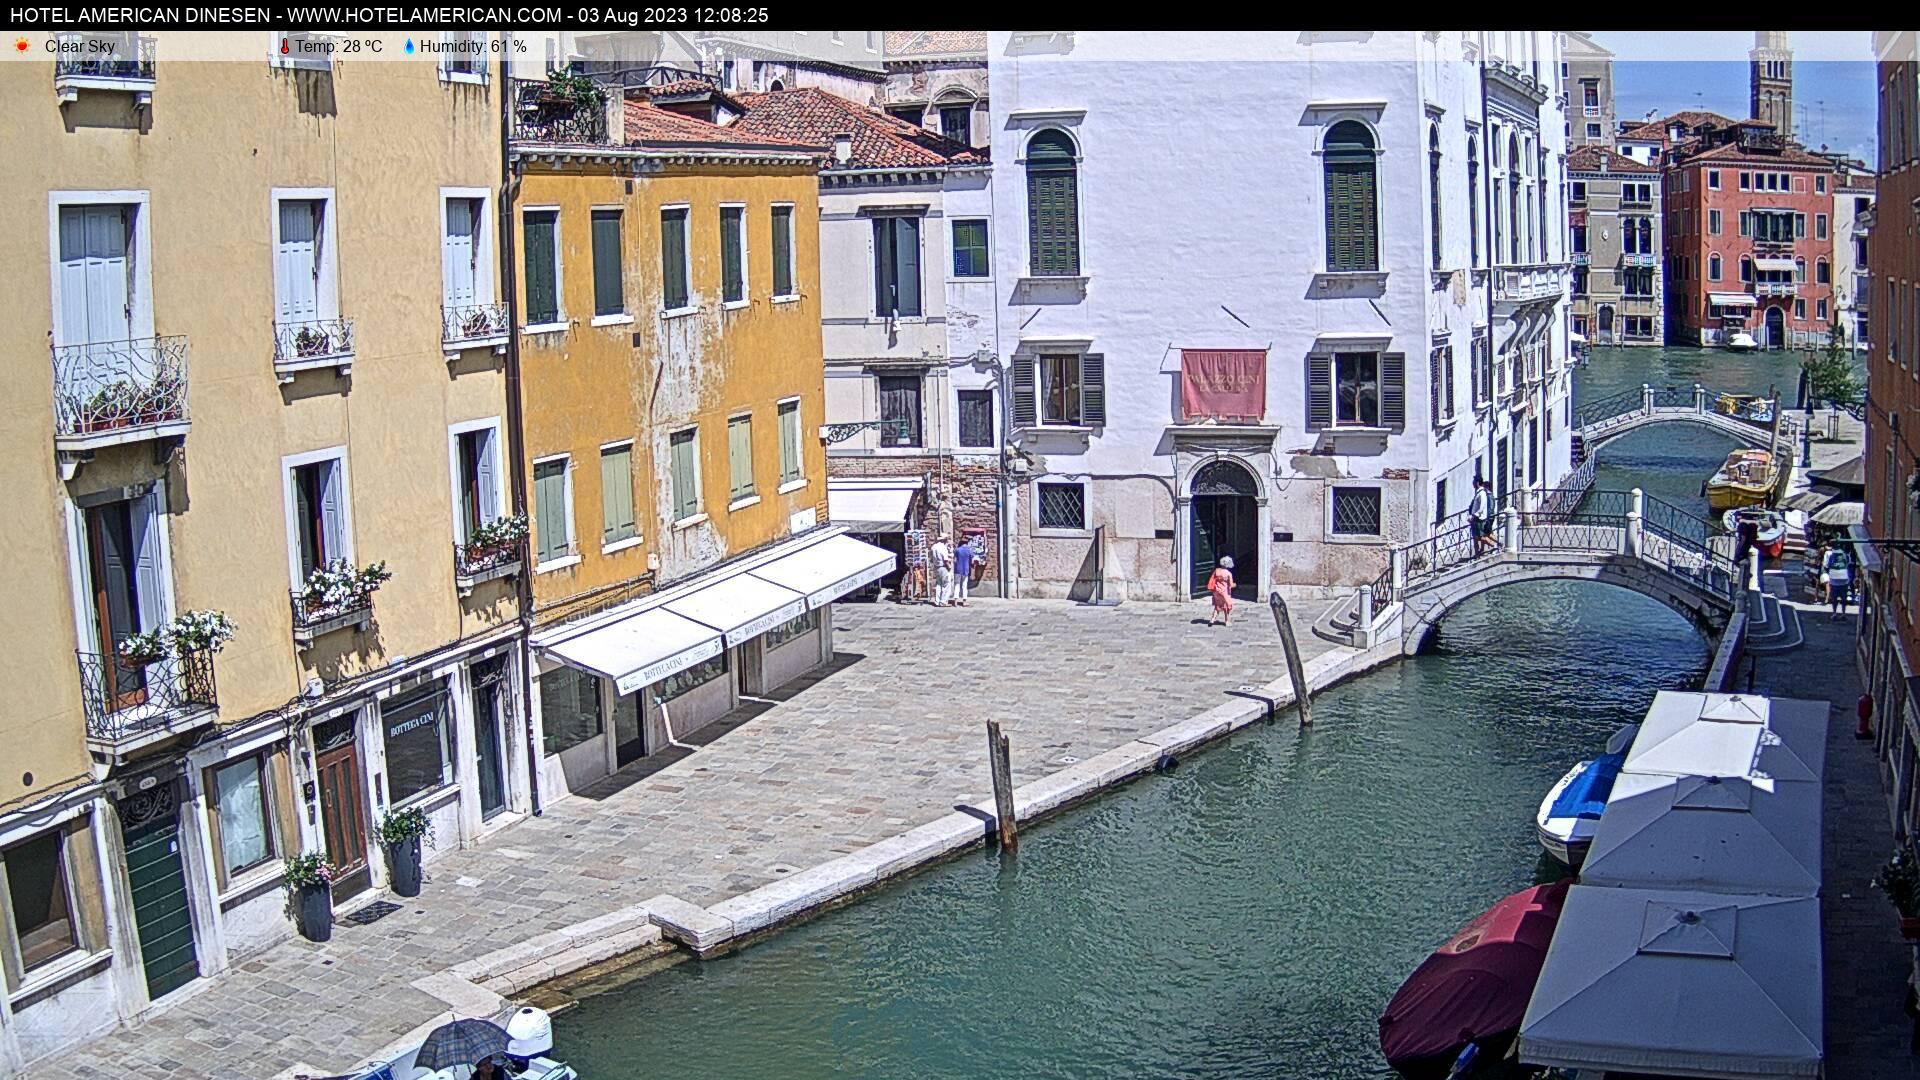 Venedig Sa. 12:08